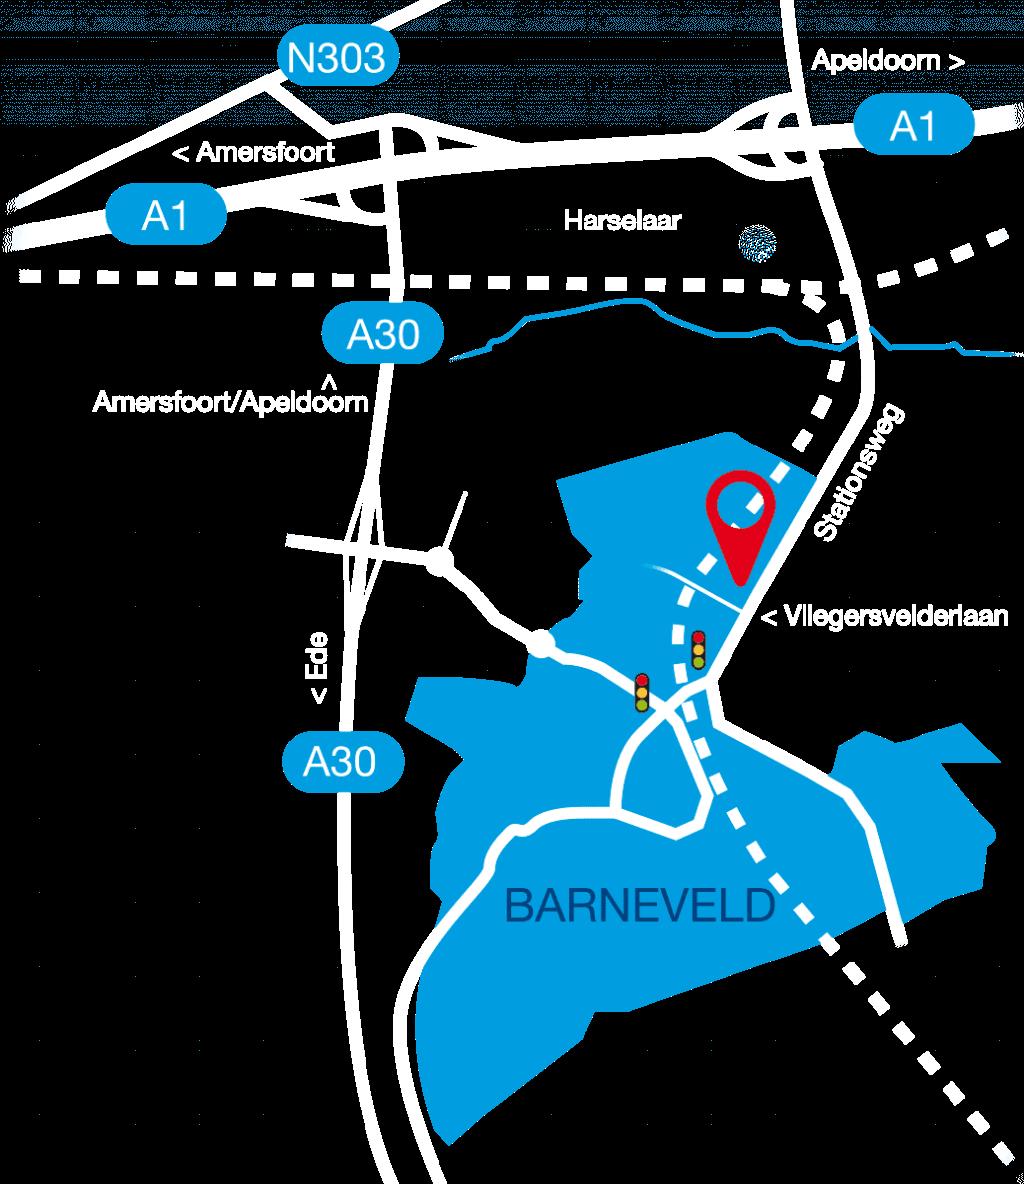 Home | Routebeschrijving | Barnevelds Tandtechnisch Laboratorium